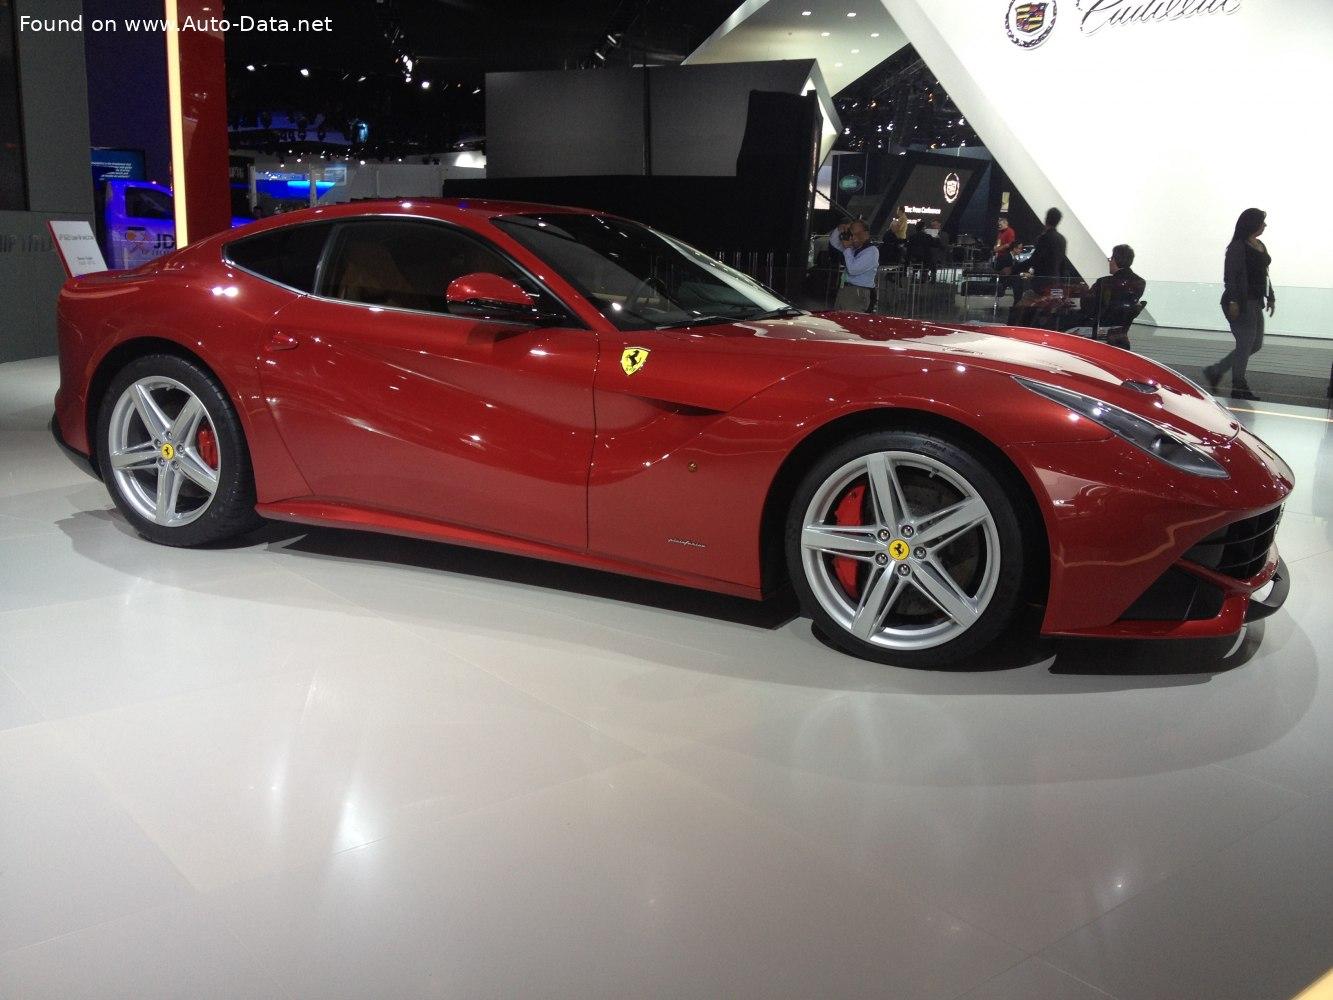 2012 Ferrari F12 Berlinetta 6 3 V12 740 Hp Technical Specs Data Fuel Consumption Dimensions